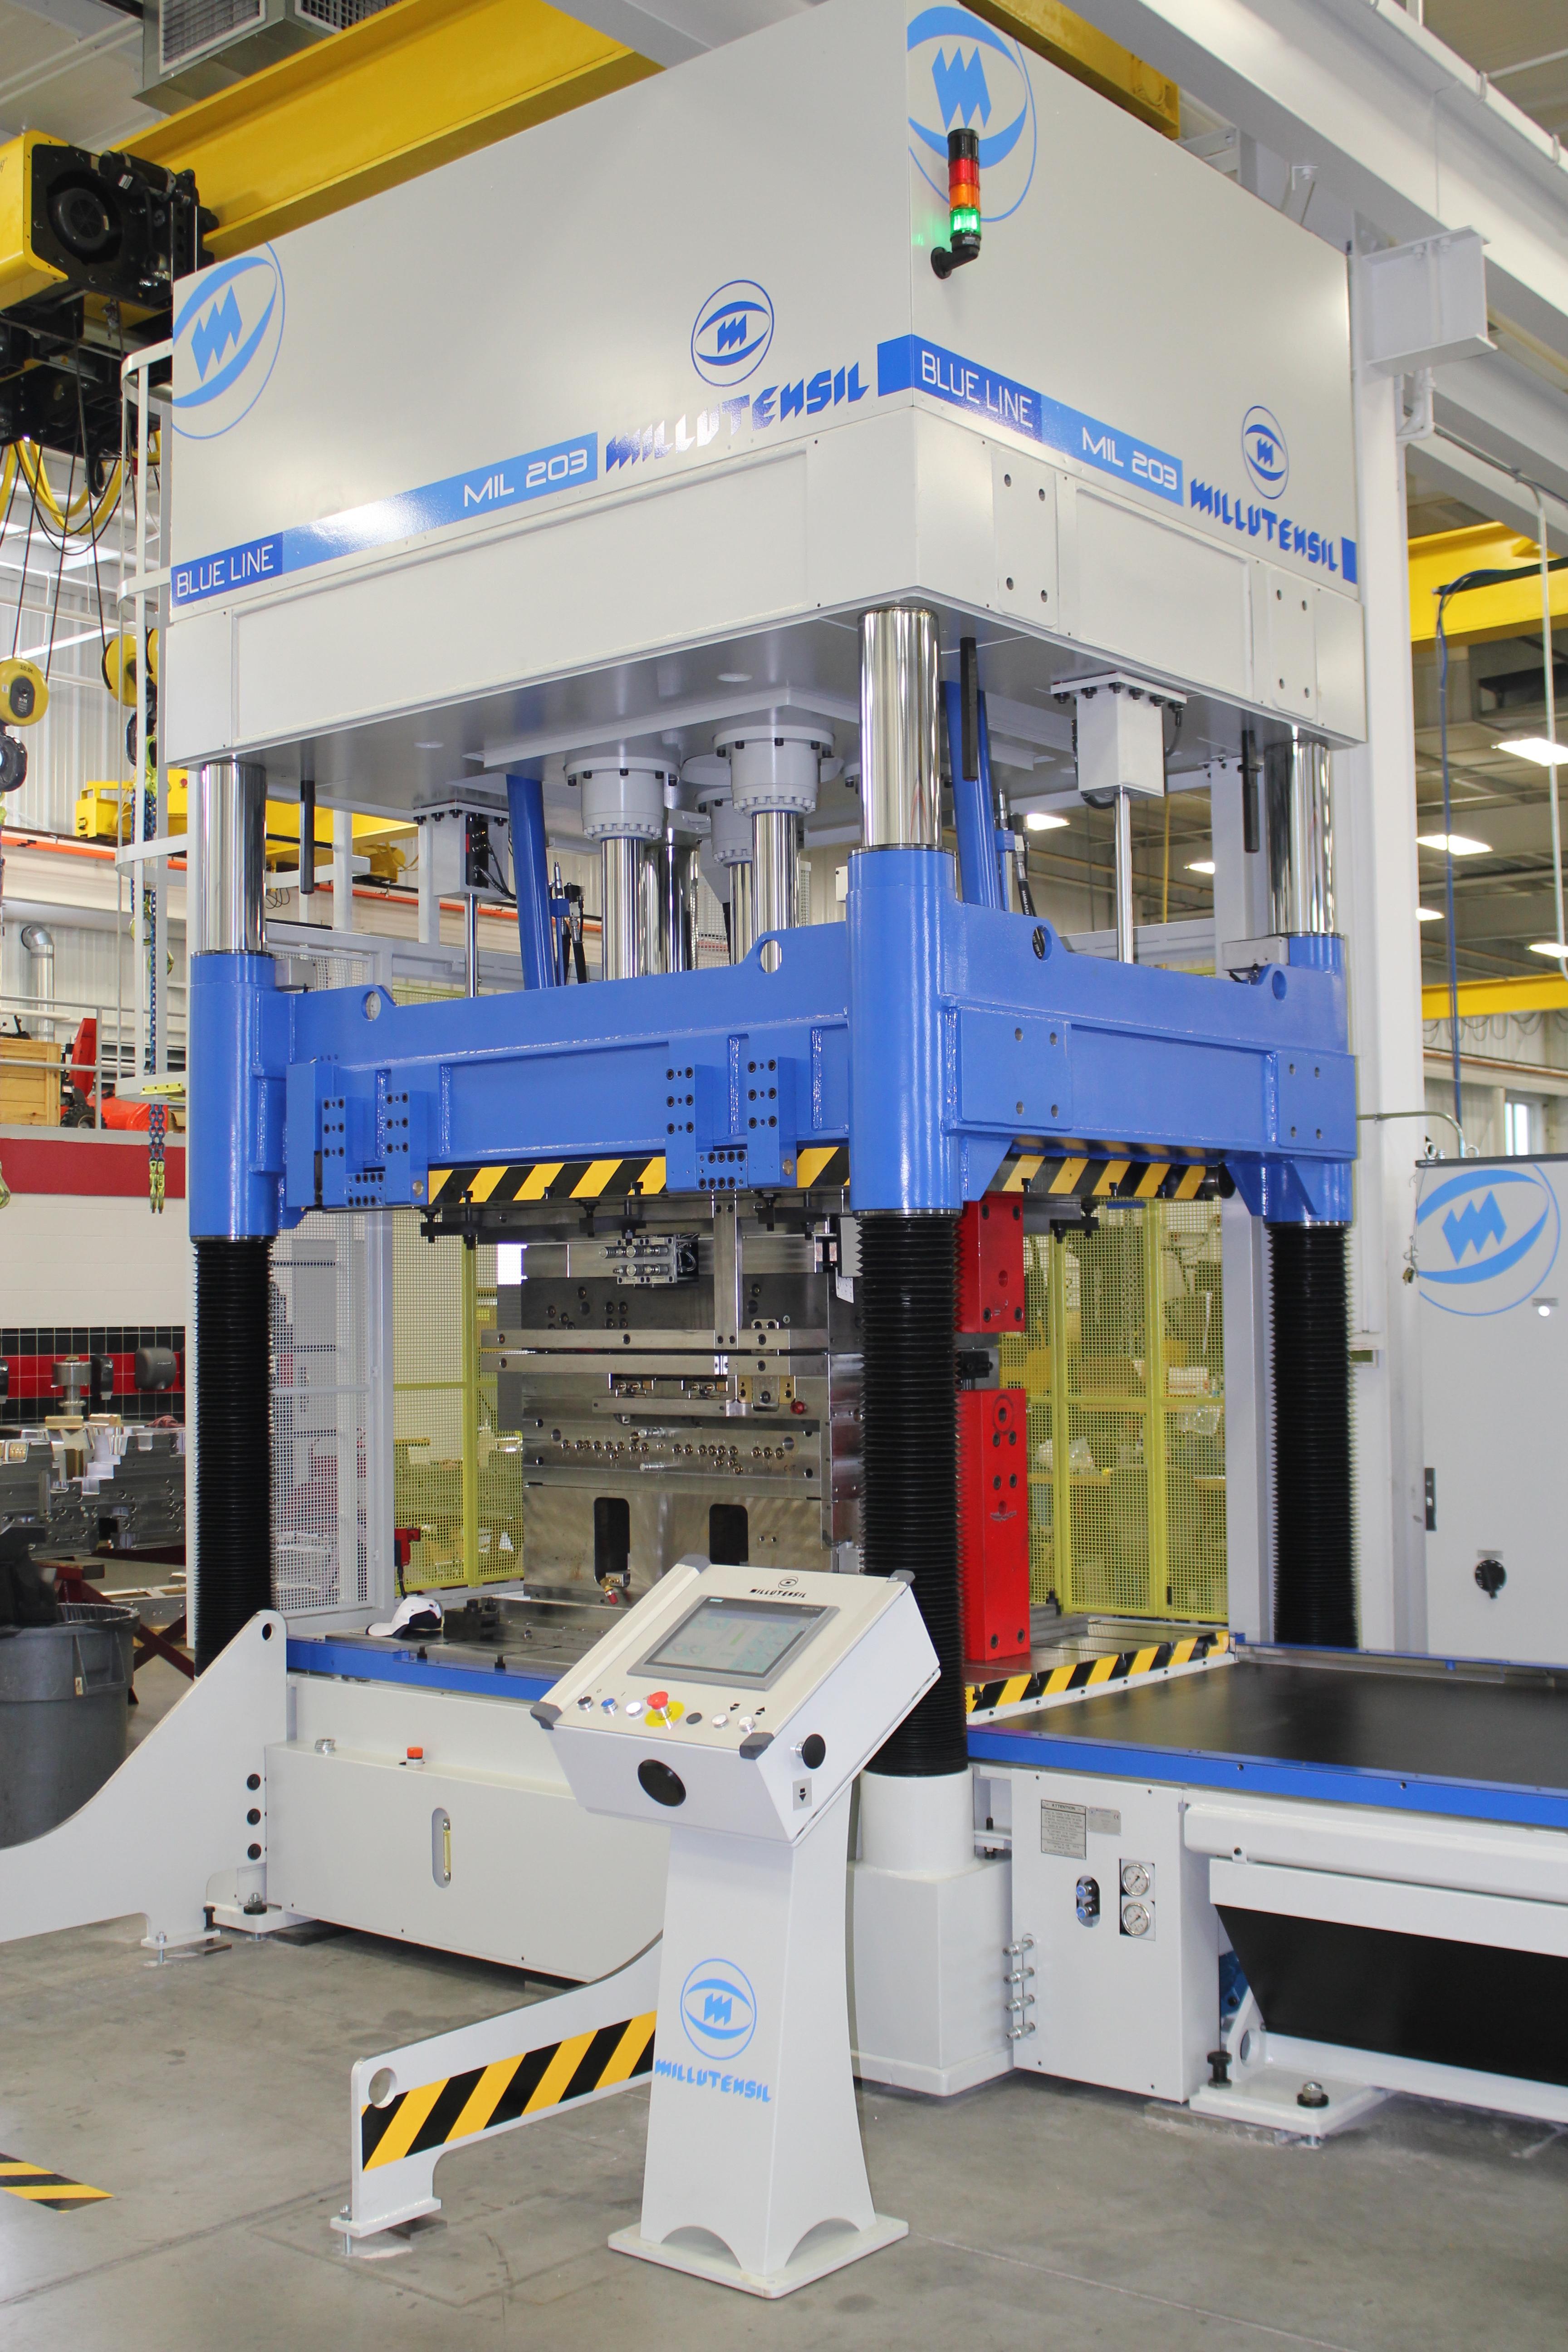 Spotting Press Ancillary Equipment, Milutensil Mil-203 Photo - Detail Technologies, LLC